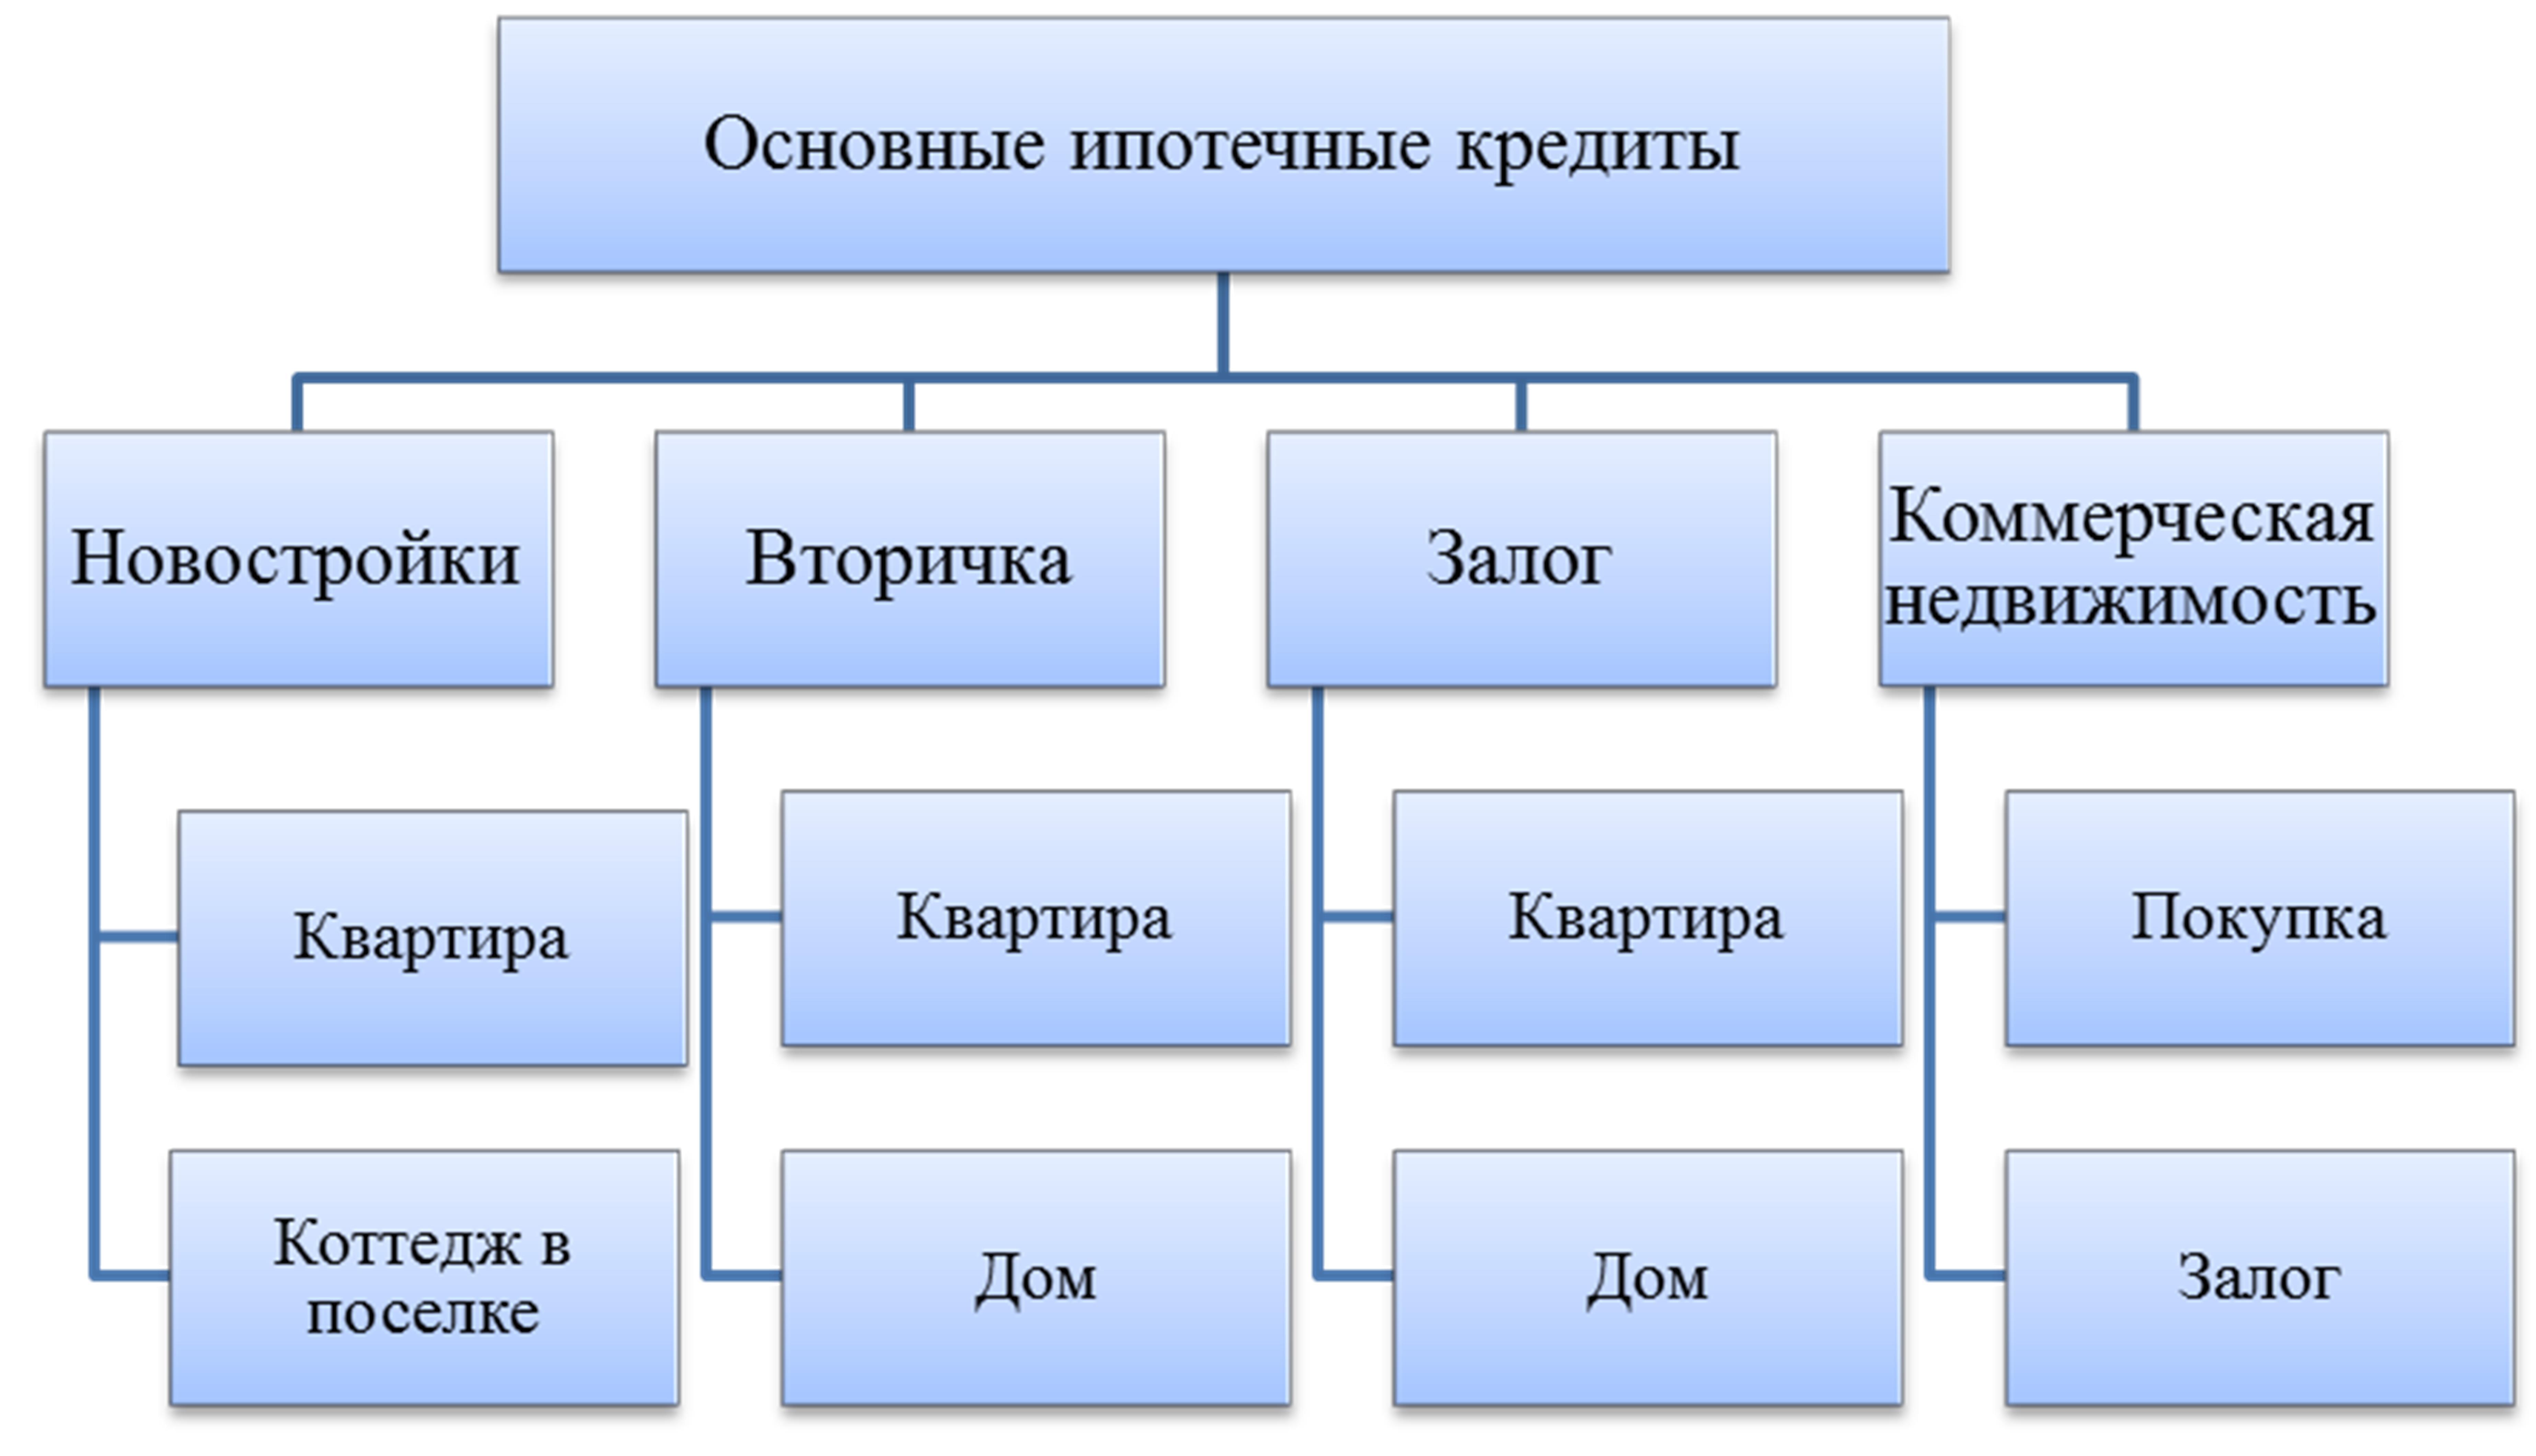 Займ переводом через систему КОНТАКТ без